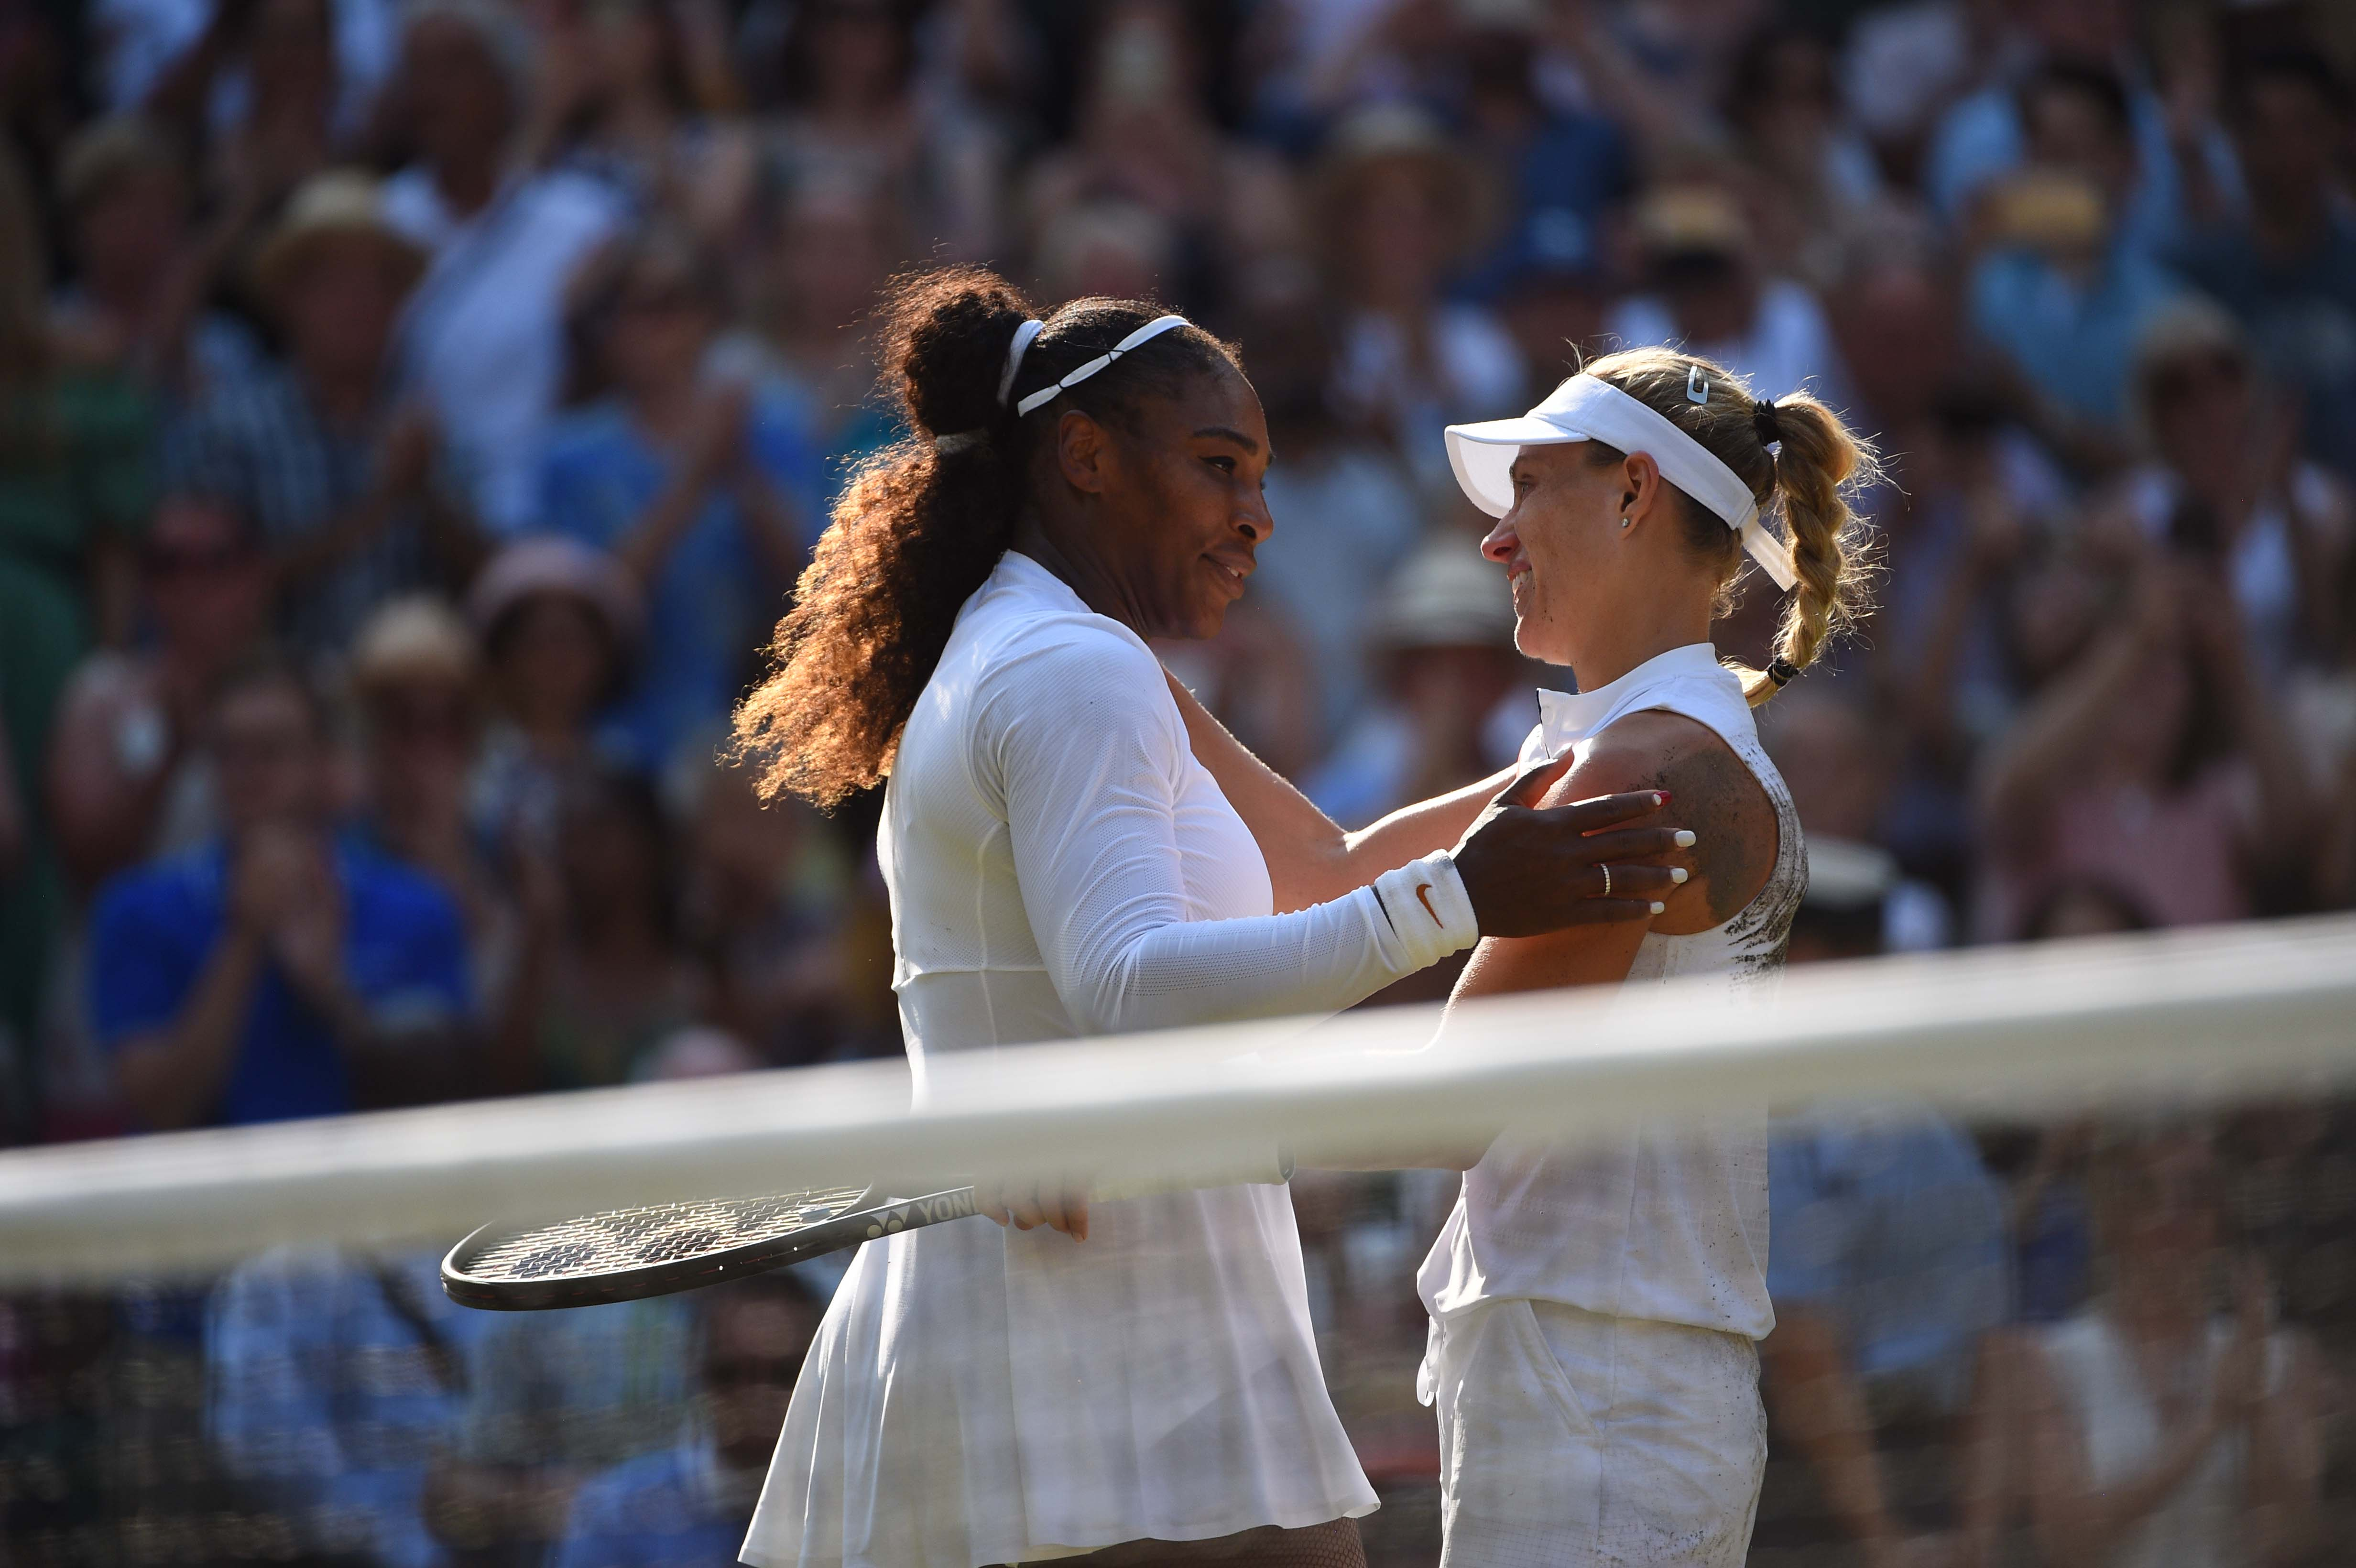 Warm embrace between Serena Williams and Angelique Kerber Wimbledon 2018